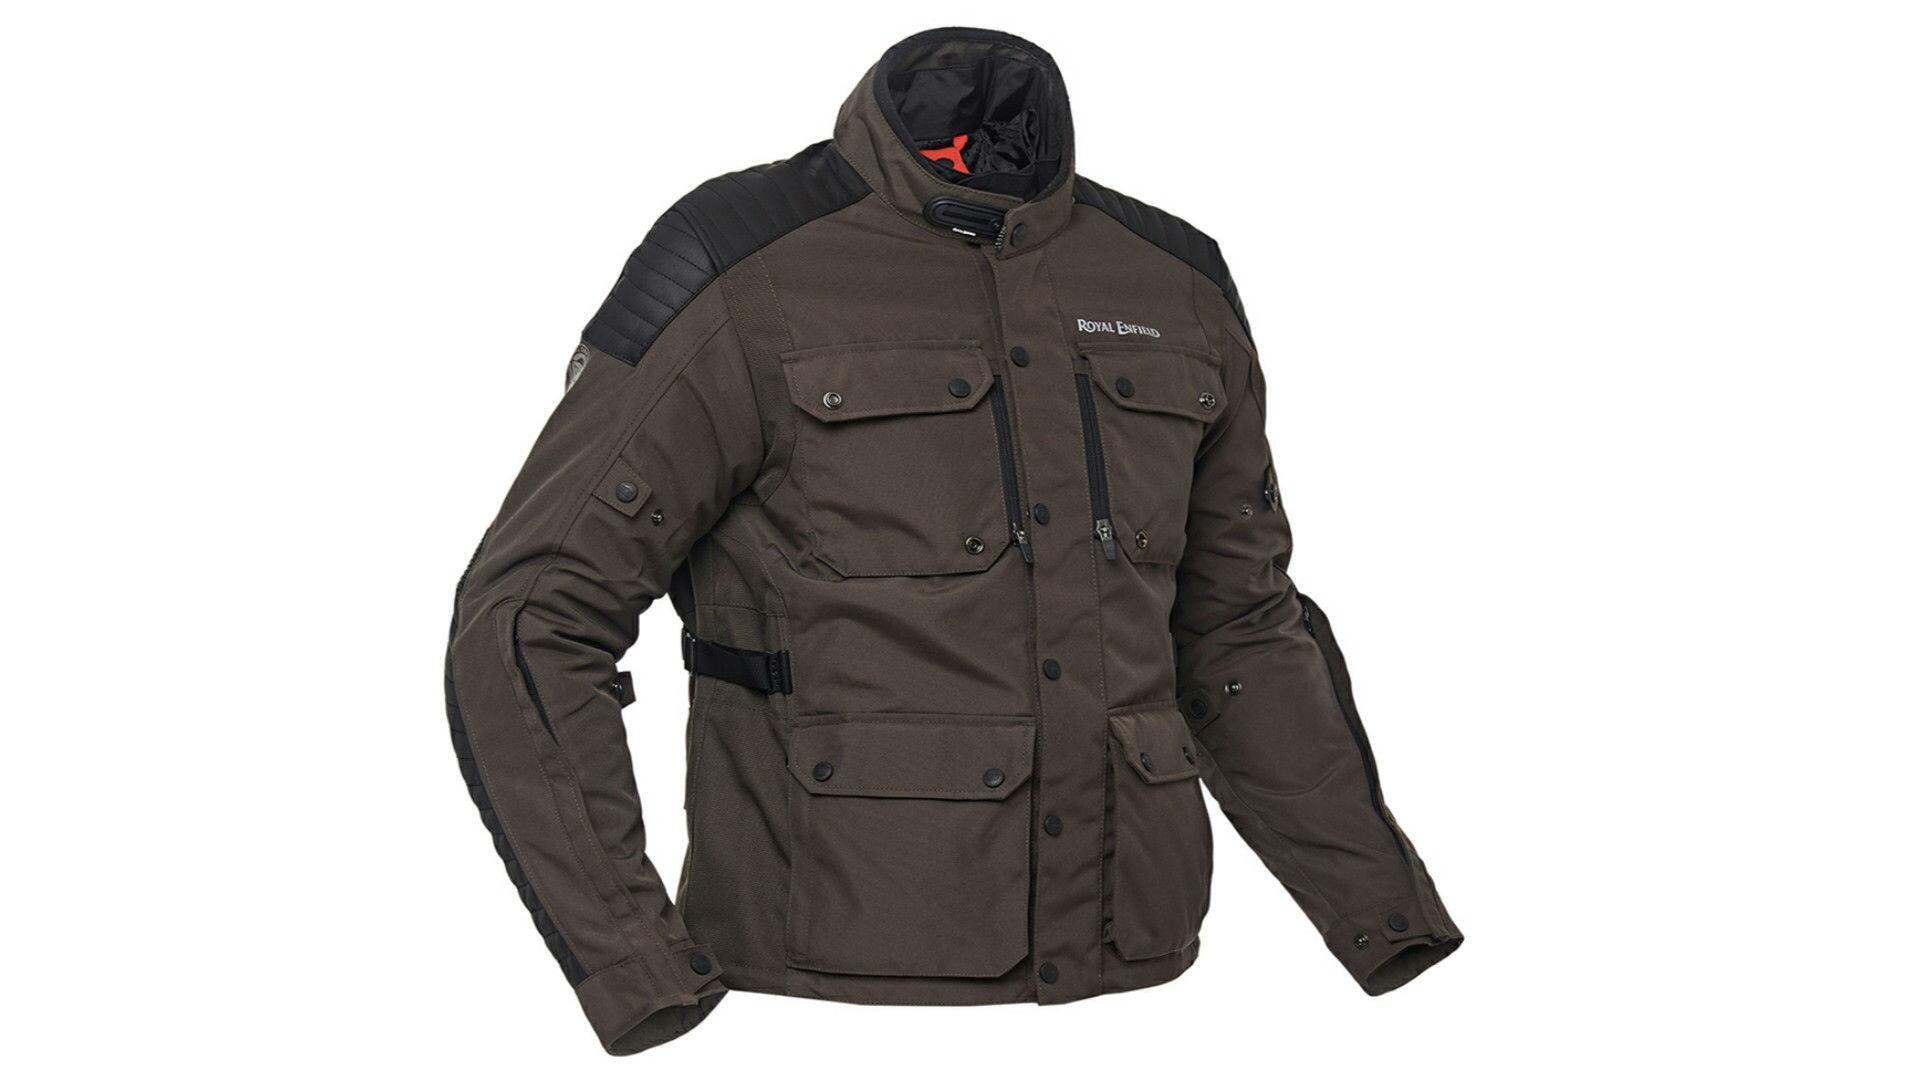 Gear Review: Royal Enfield Khardung La Jacket